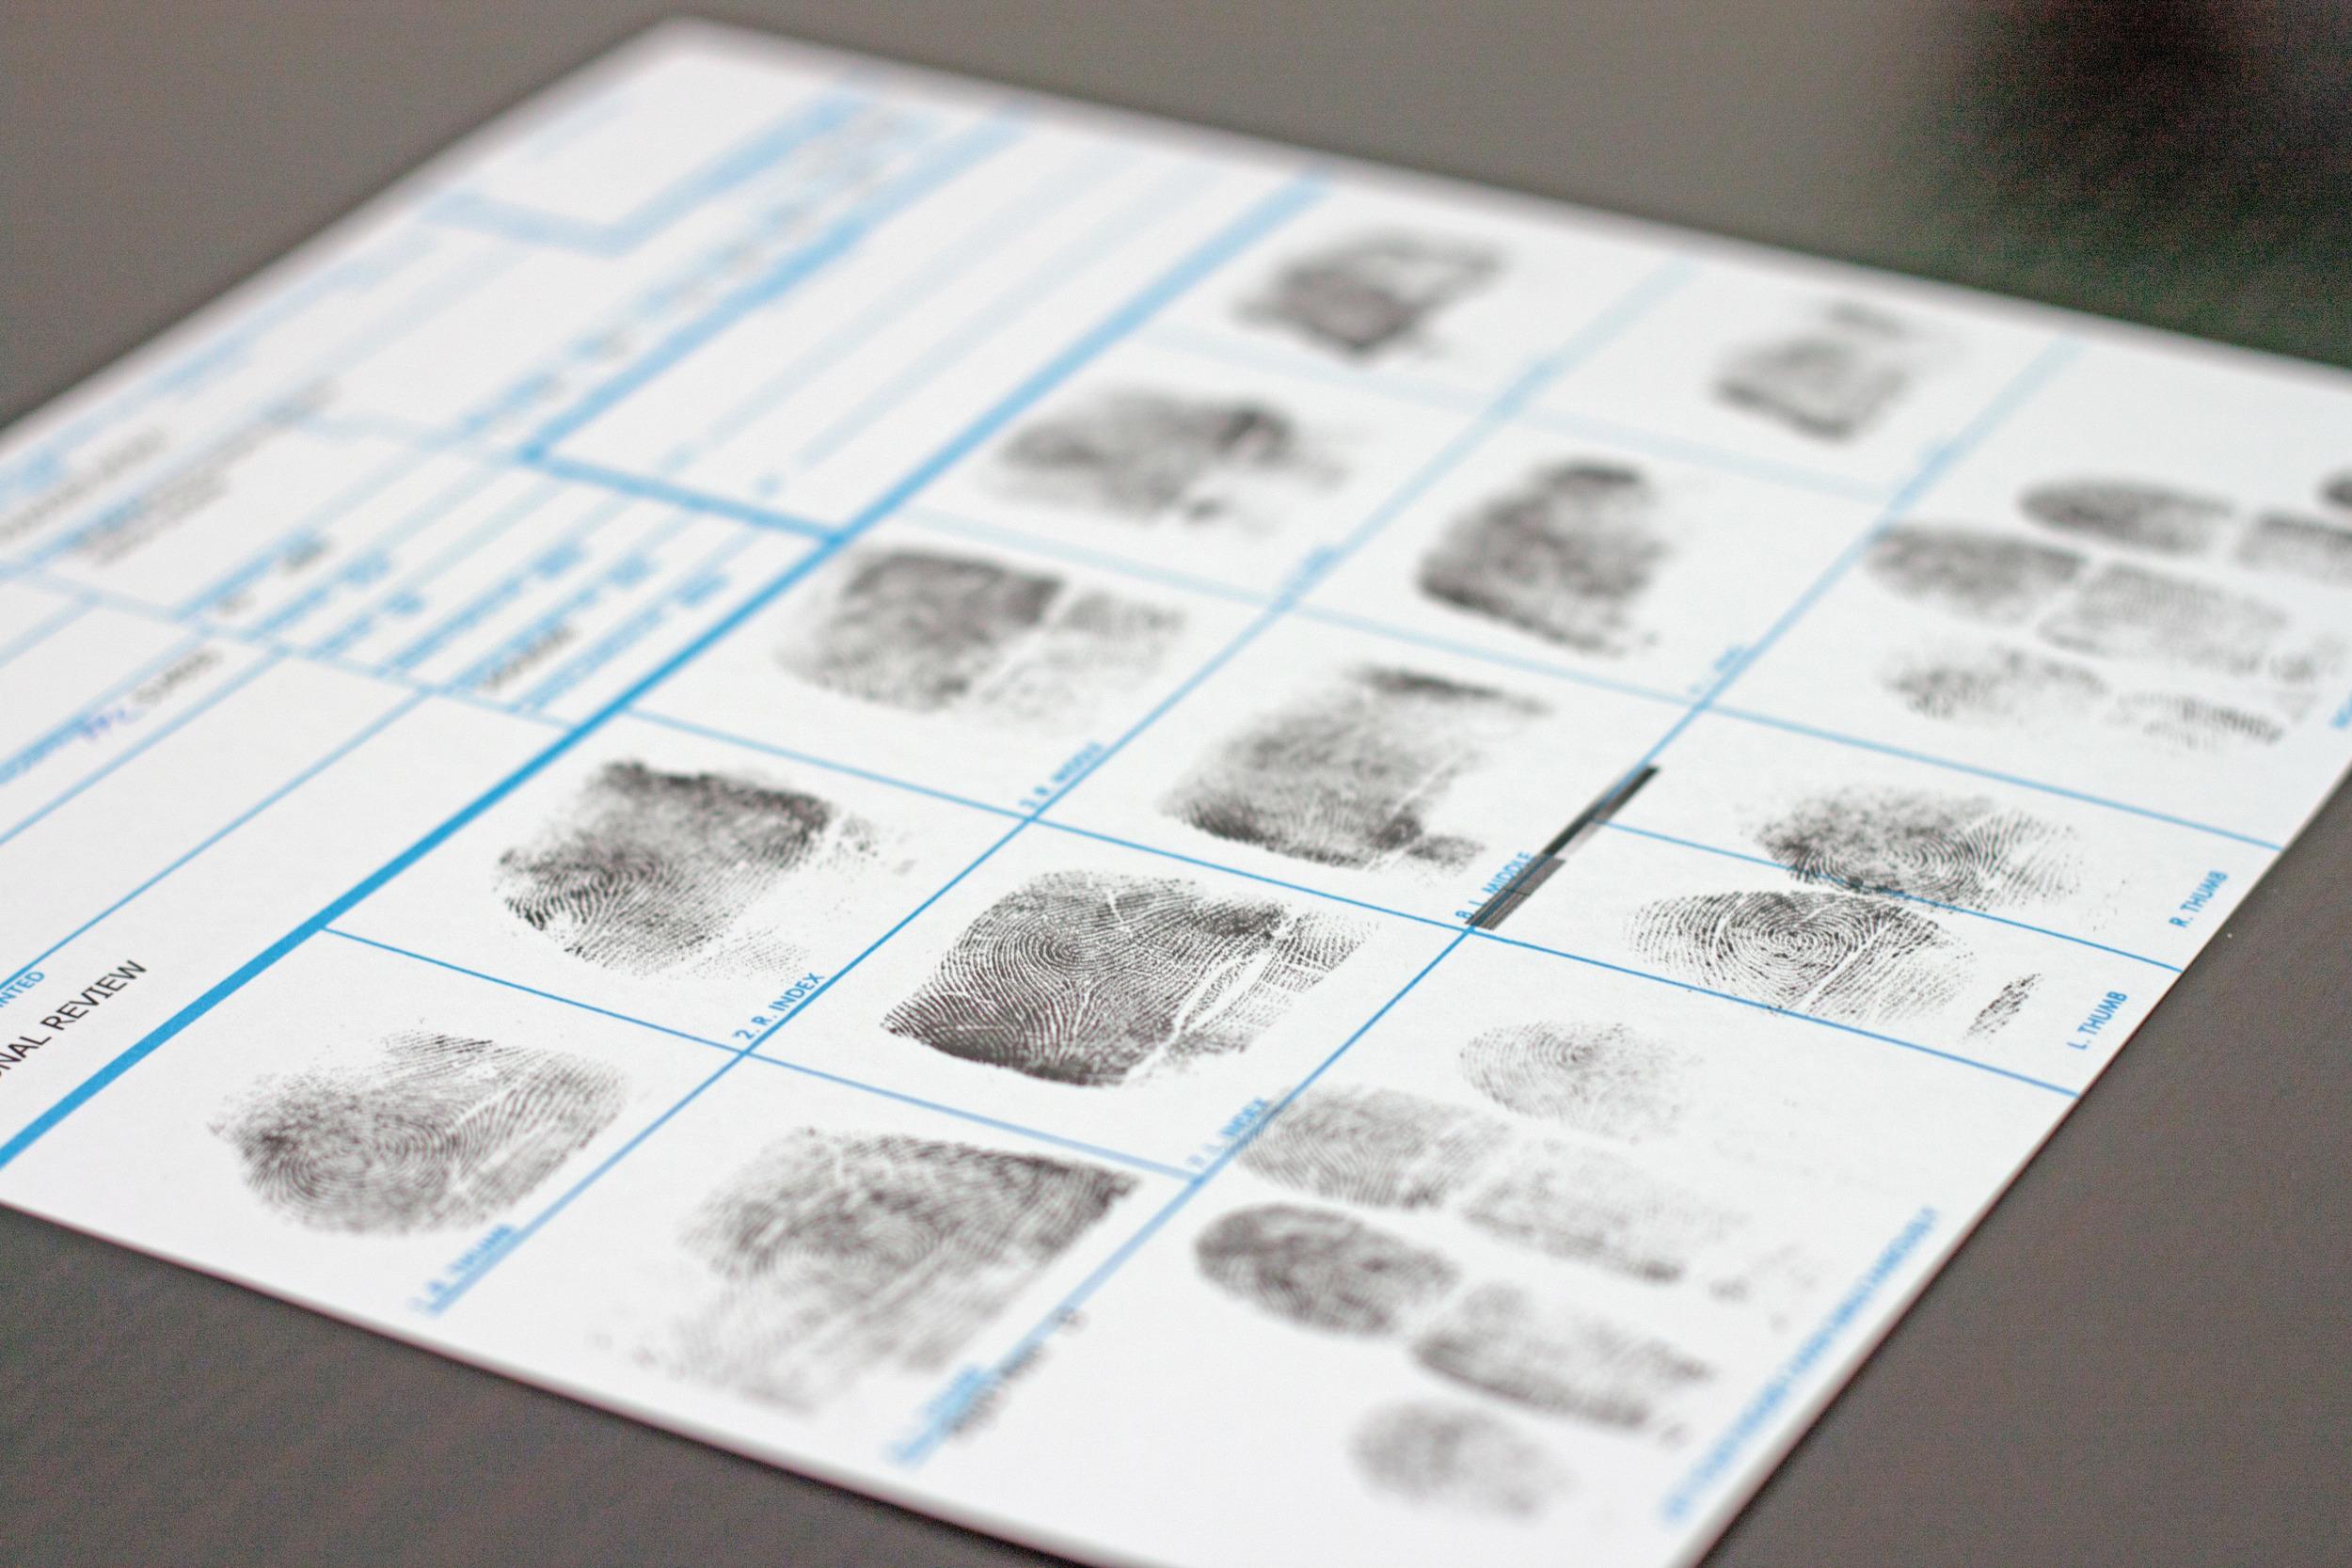 Fbi inked fingerprints fnl fingerprints notary public live fd 258 003 copyg falaconquin